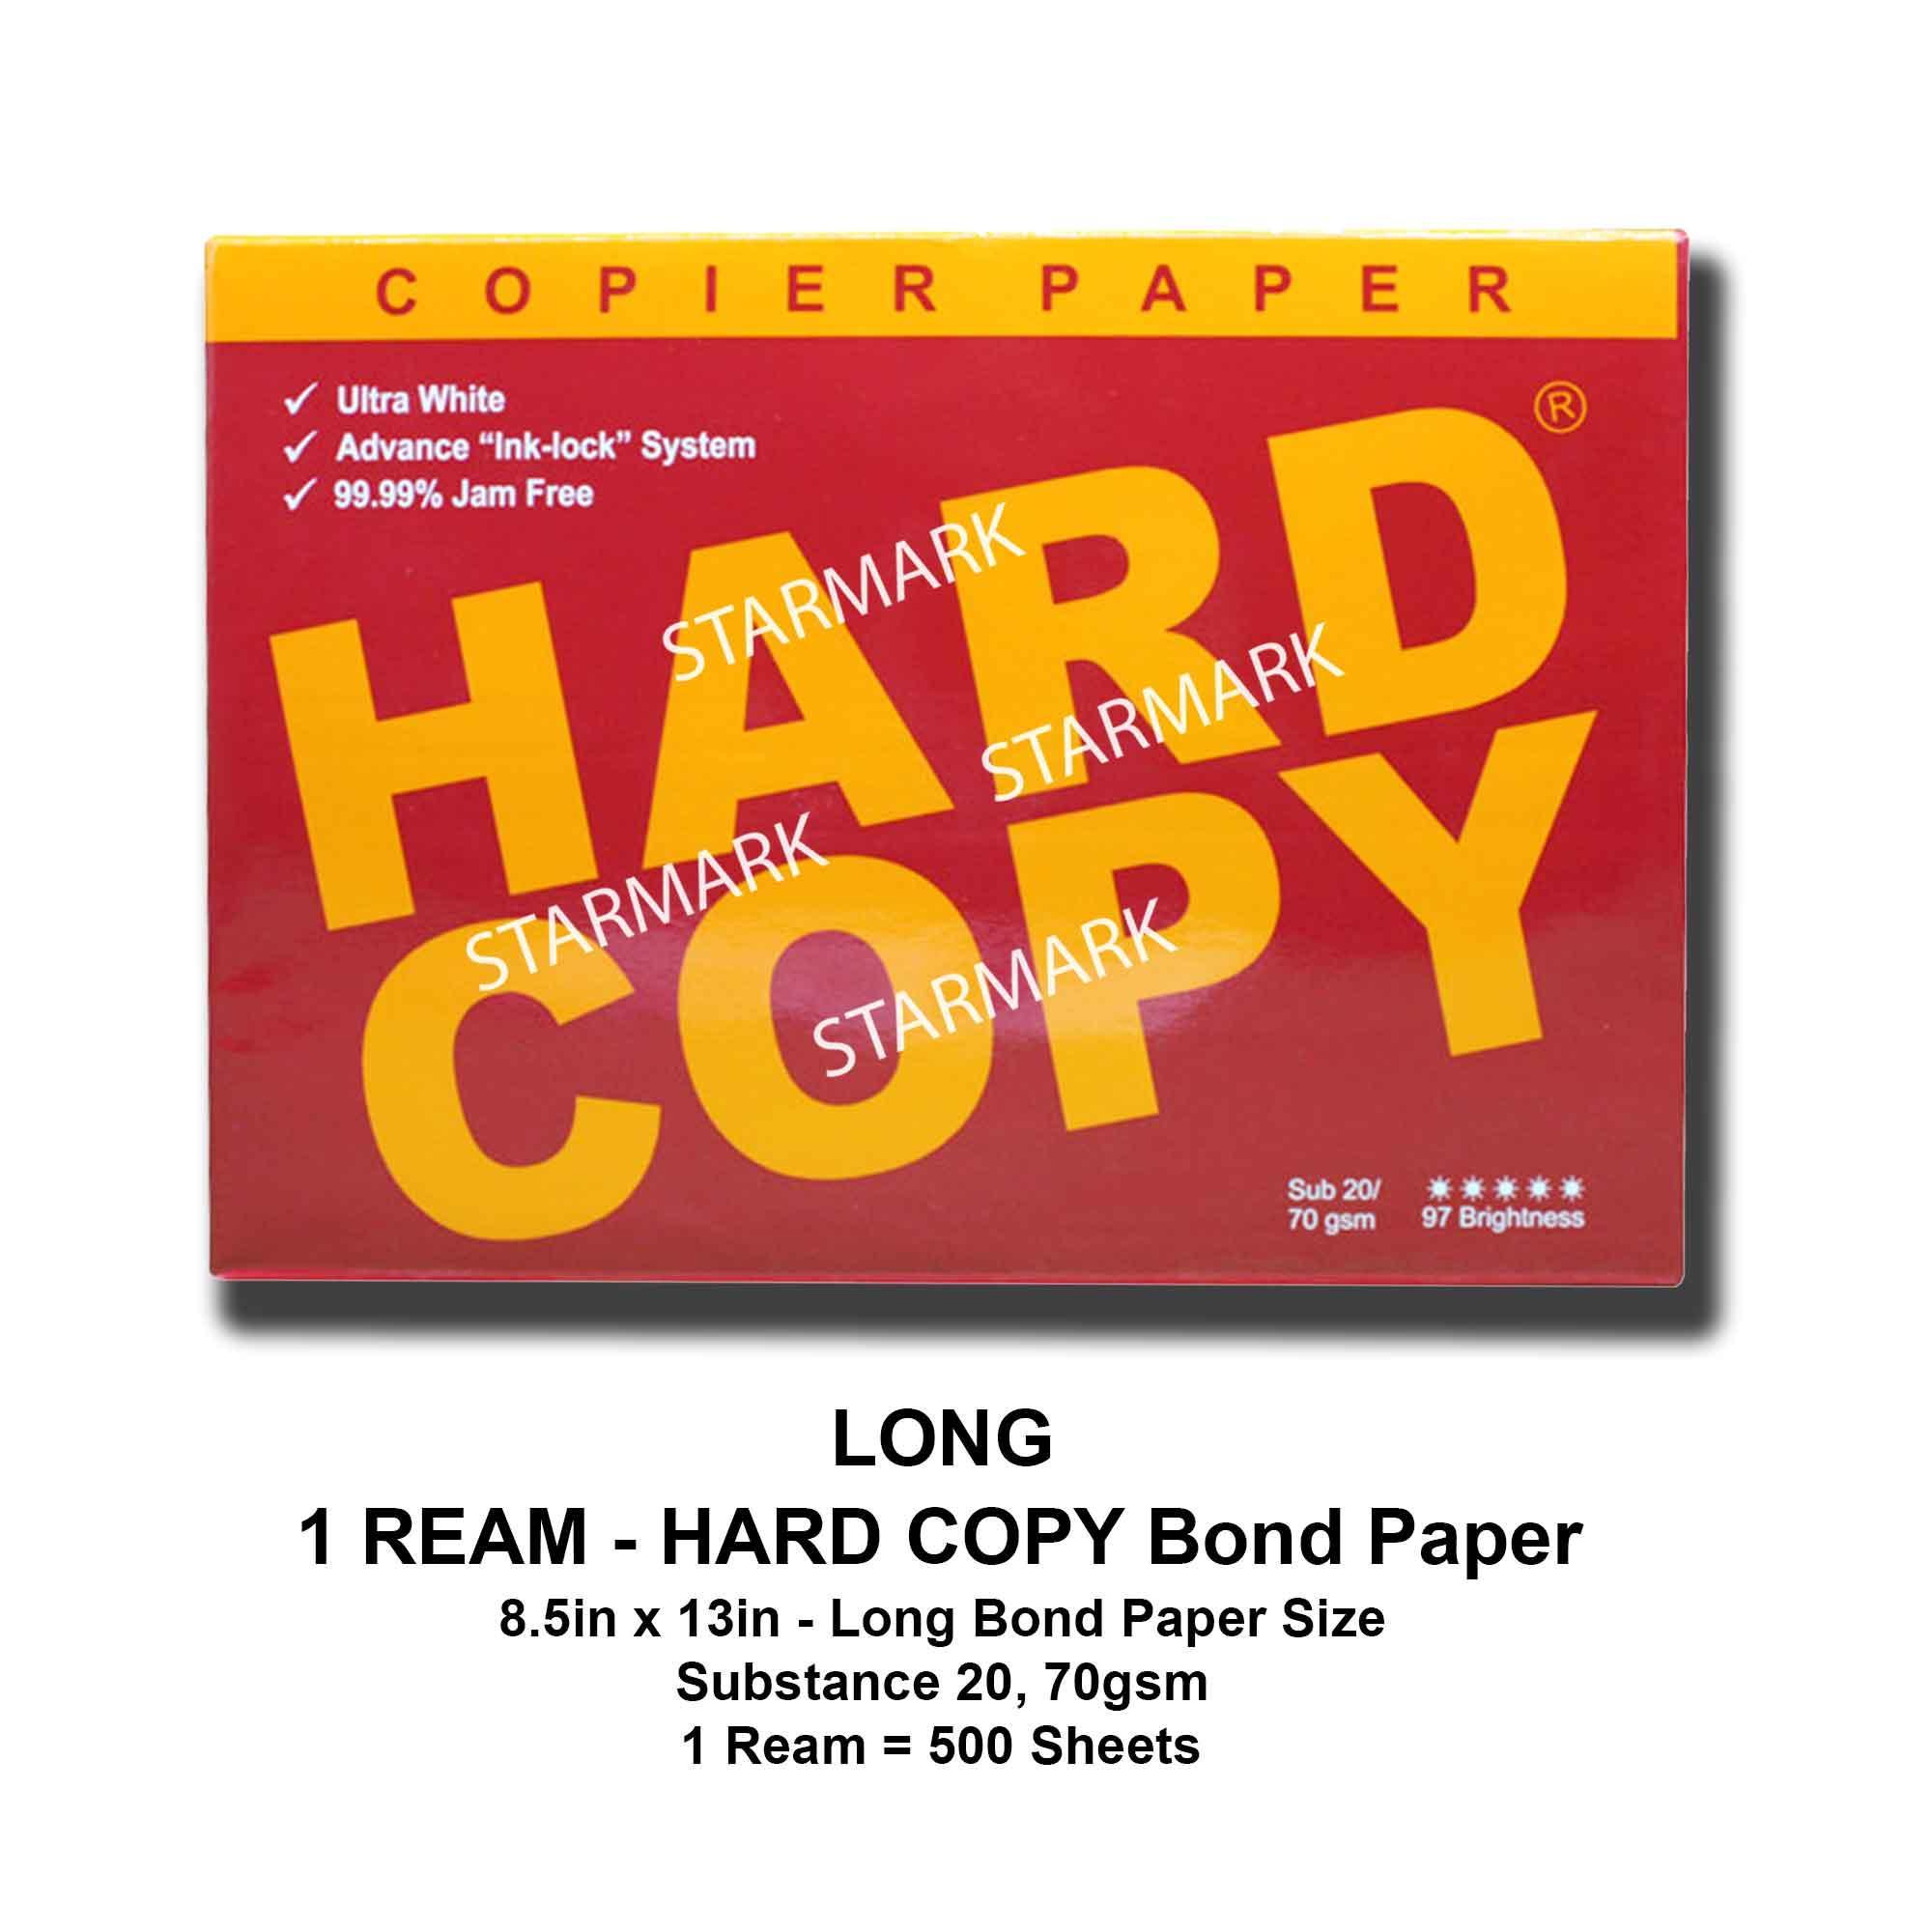 Hard Copy Bond Paper - 1 Ream Long Bond Paper Size - 8.5x13 Inches - Substance 20, 70gsm - Original - 500 Sheets By Starmark Enterprises.